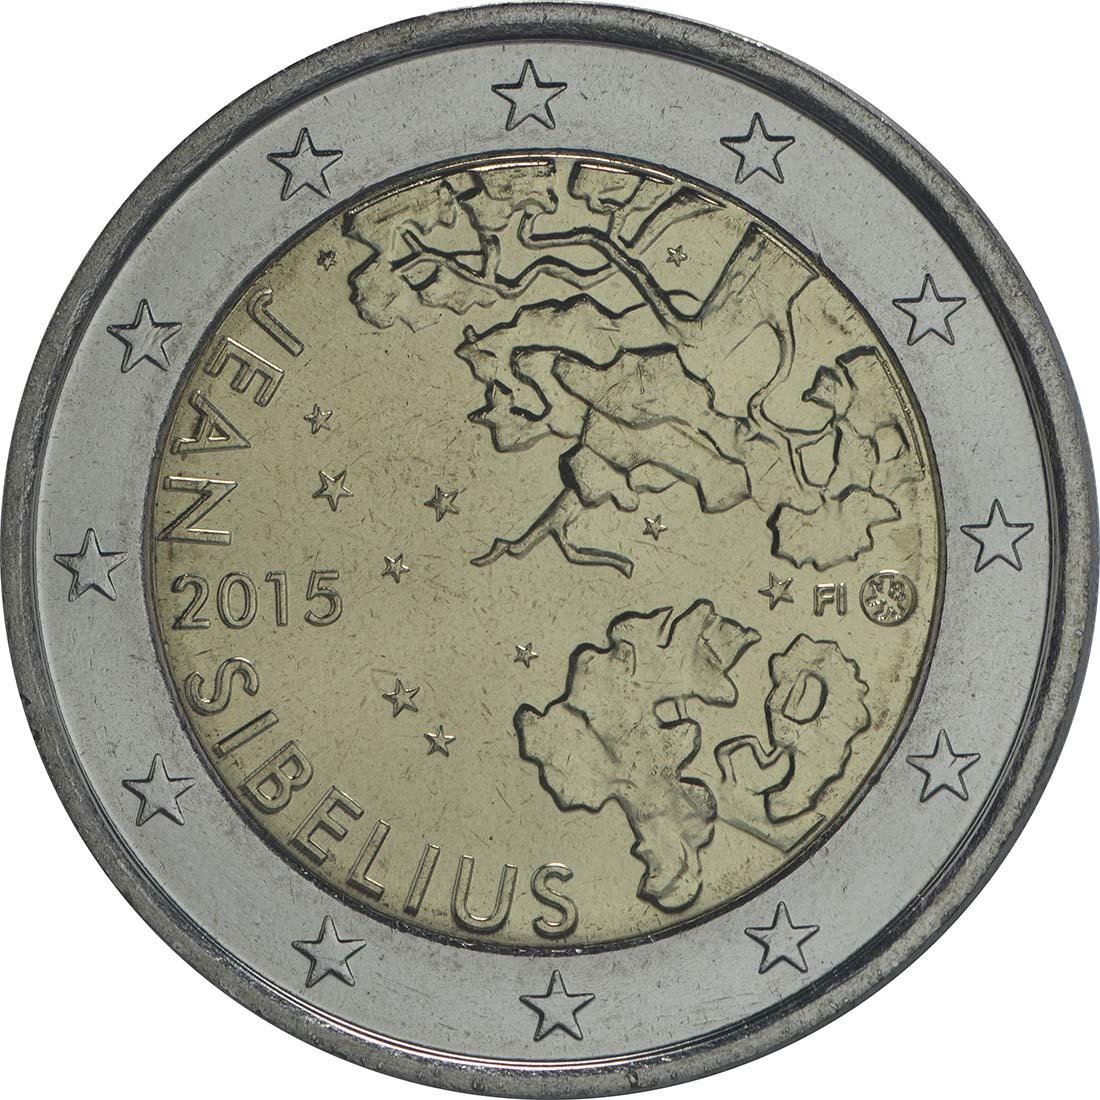 2015 190 Finnland Sibelius.jpg